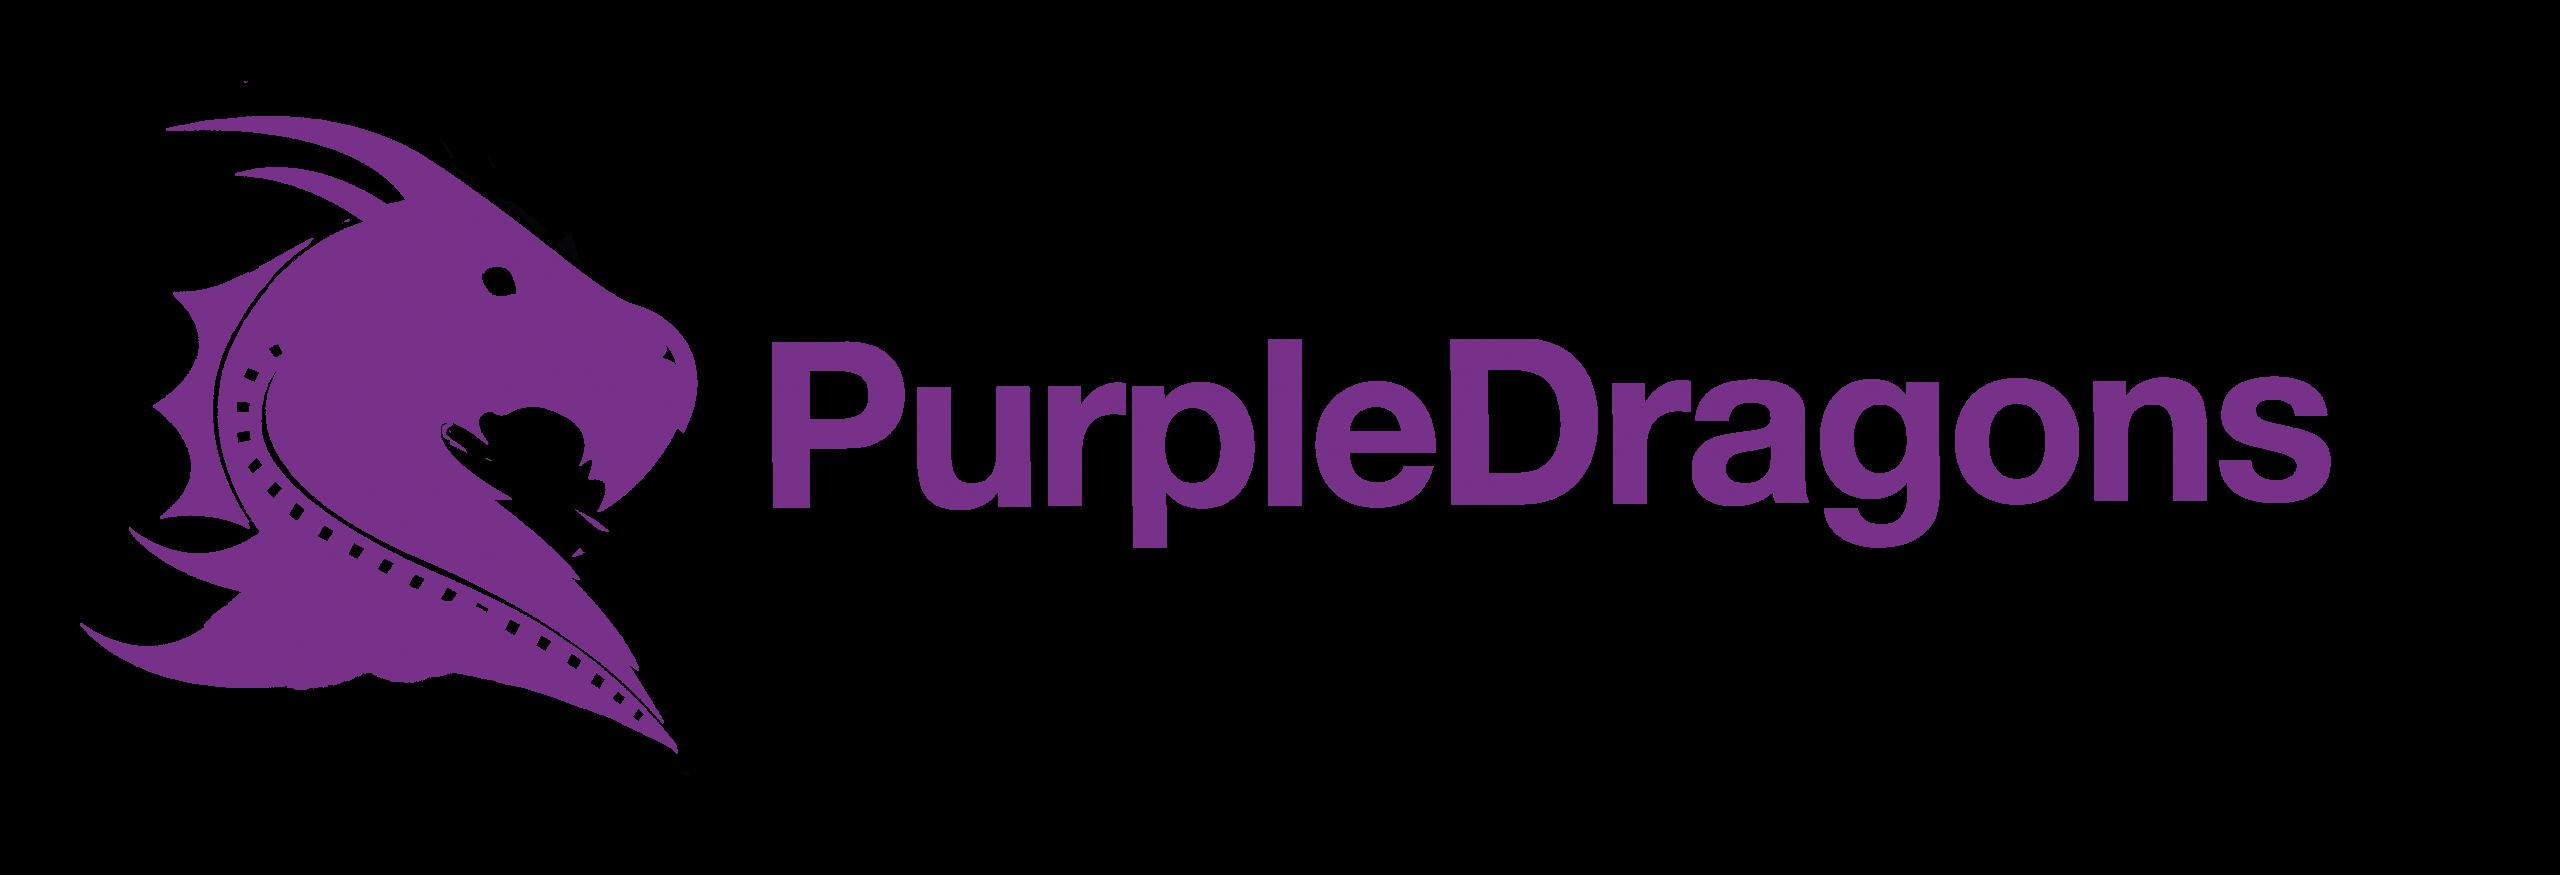 PurpleDragons